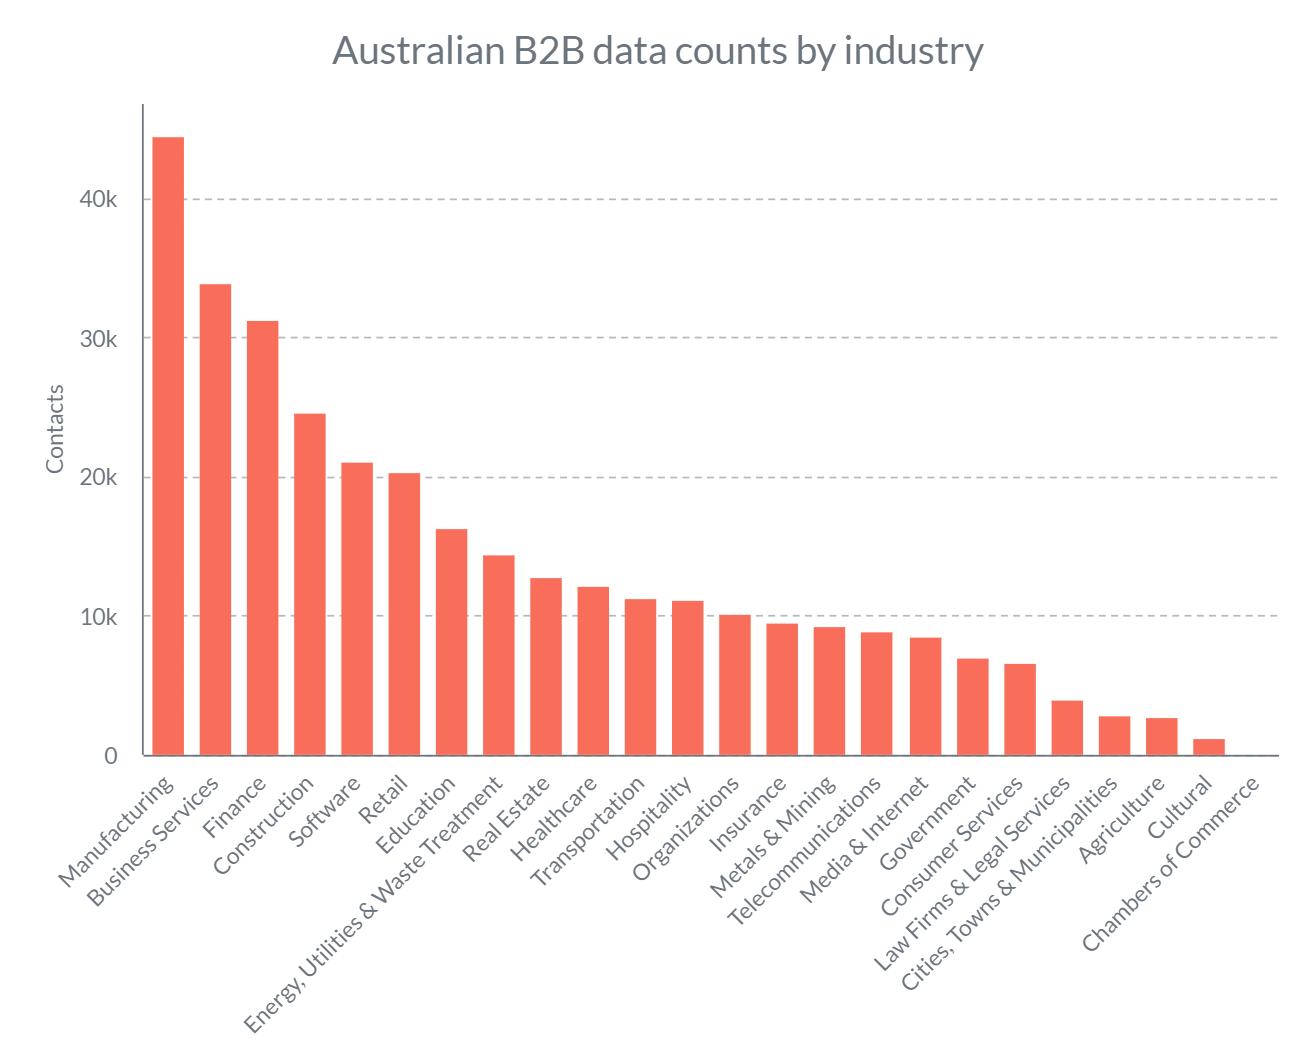 Australian b2b data counts by industry